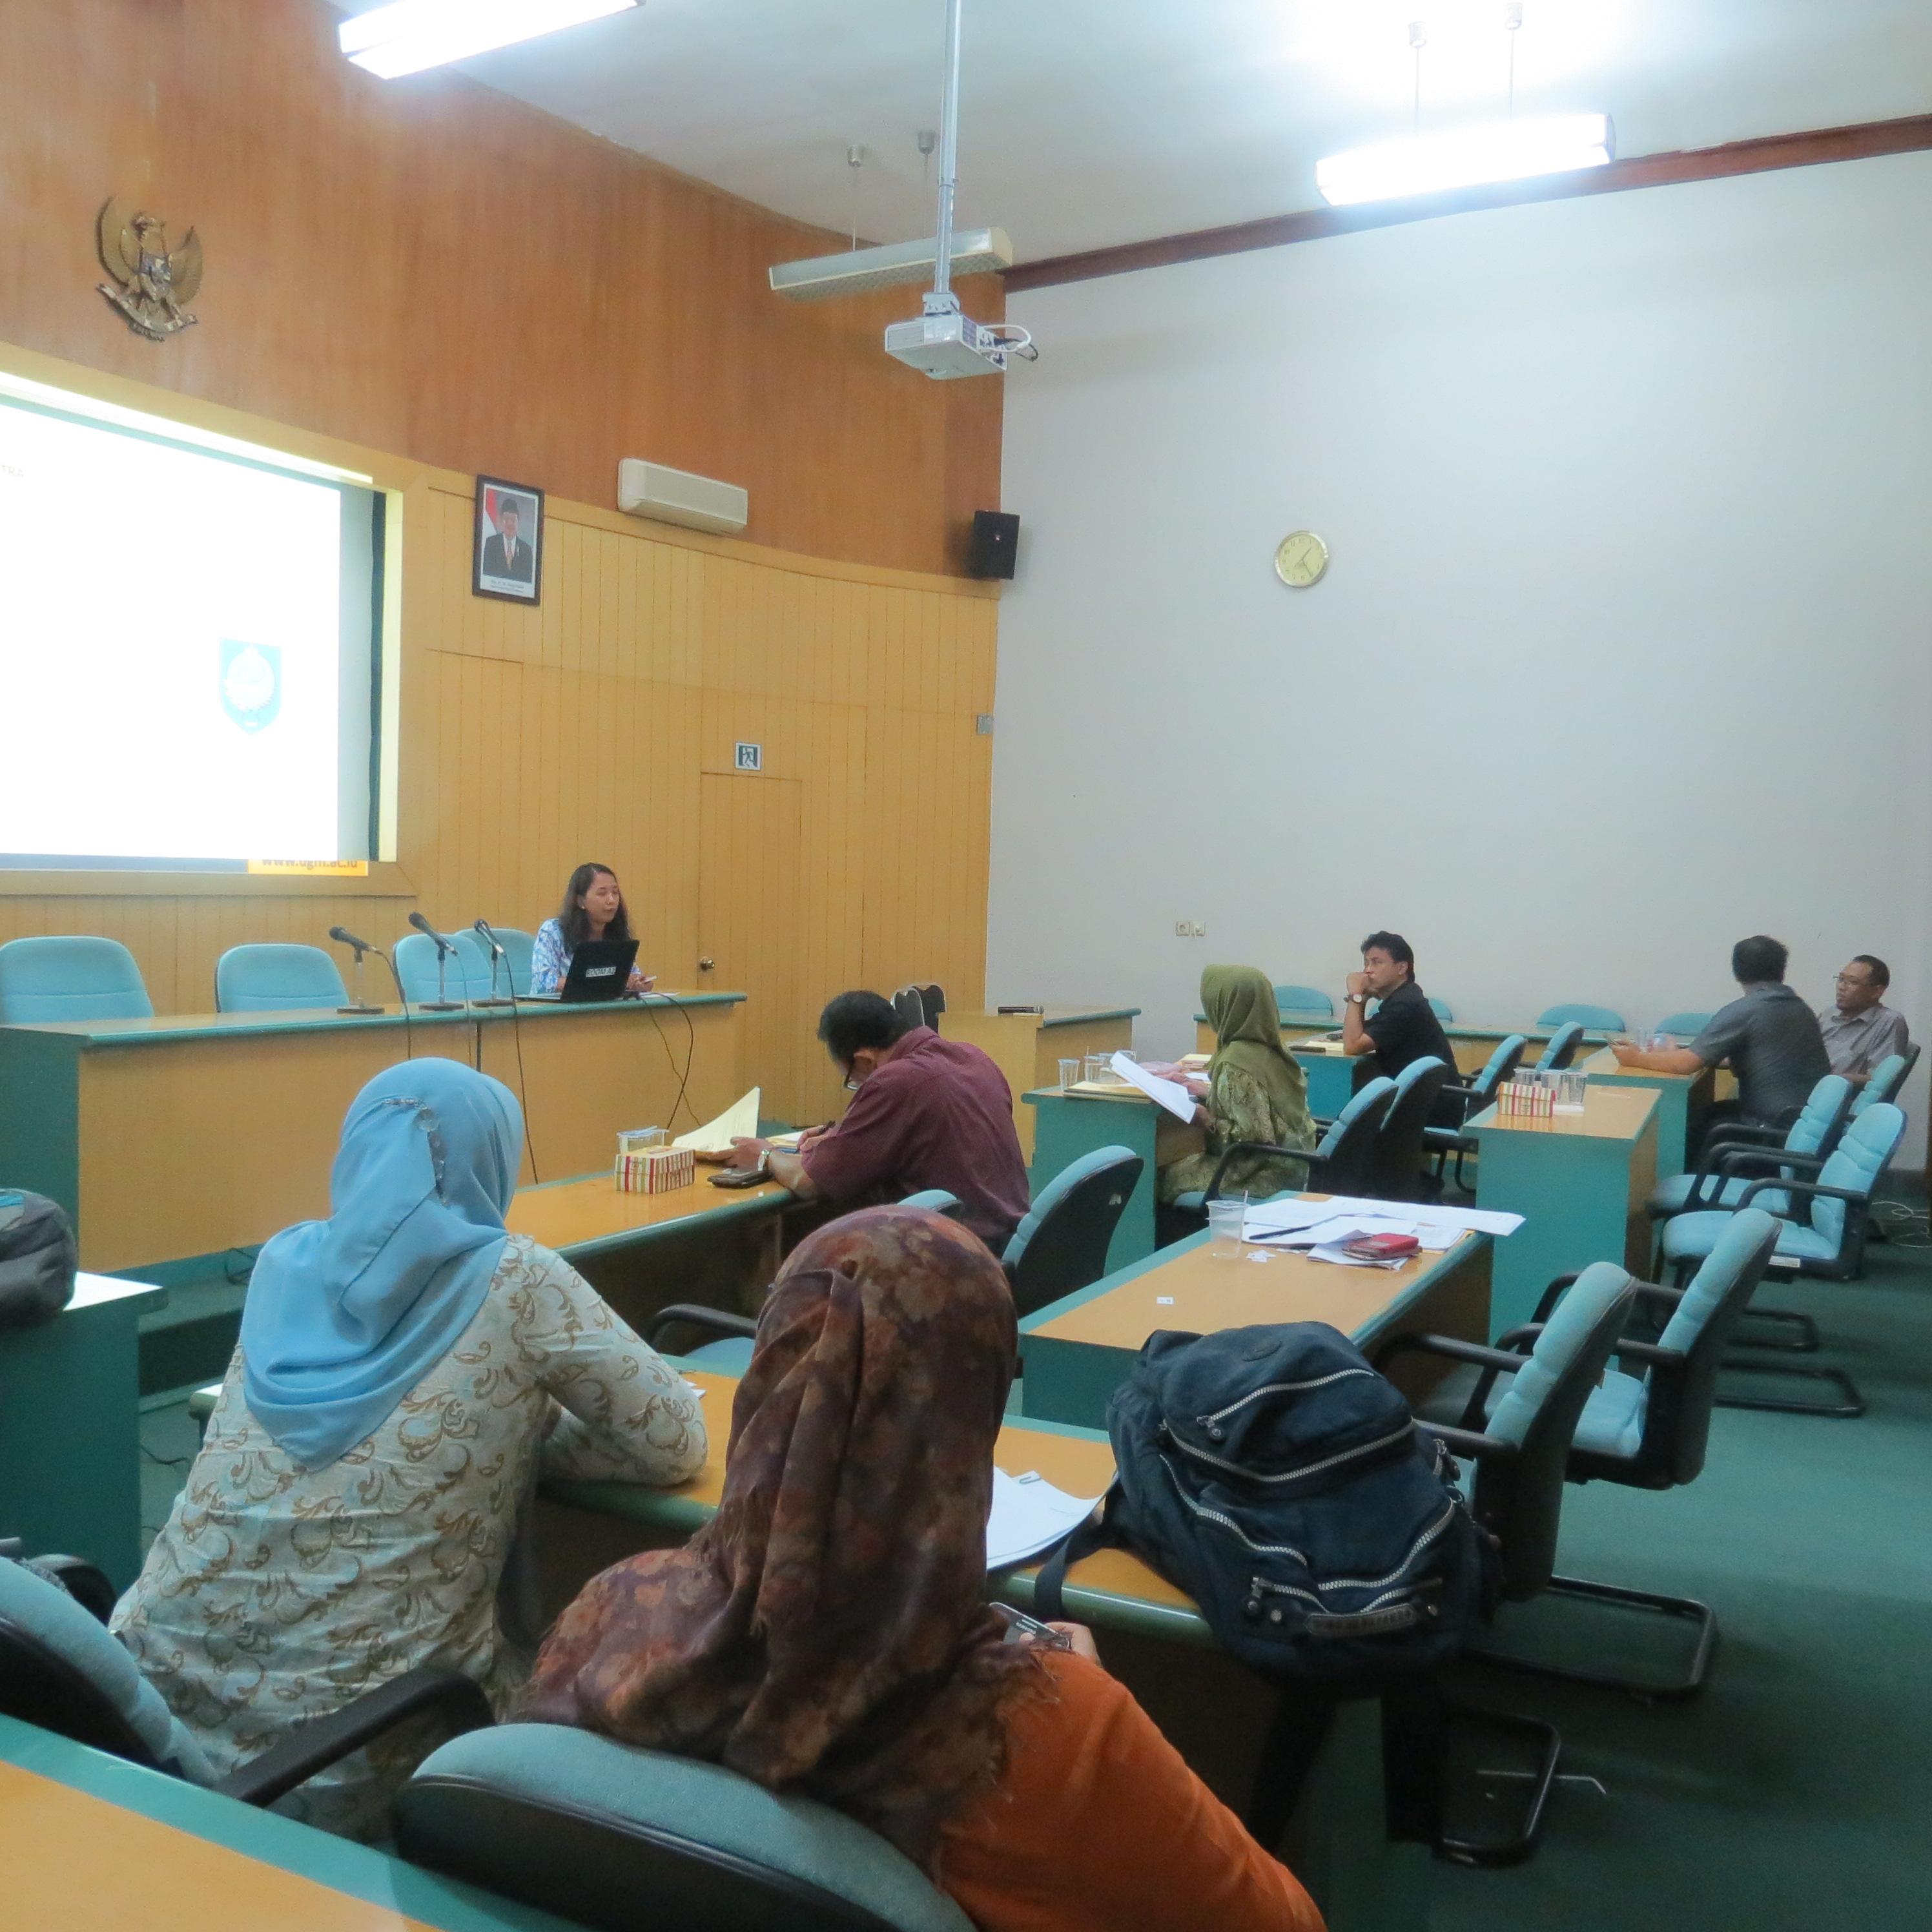 Presentasi proposal pengabdian skema Education for Sustainable Developmet ESD Tahun 2017 (DPKM,16 Maret 2017)